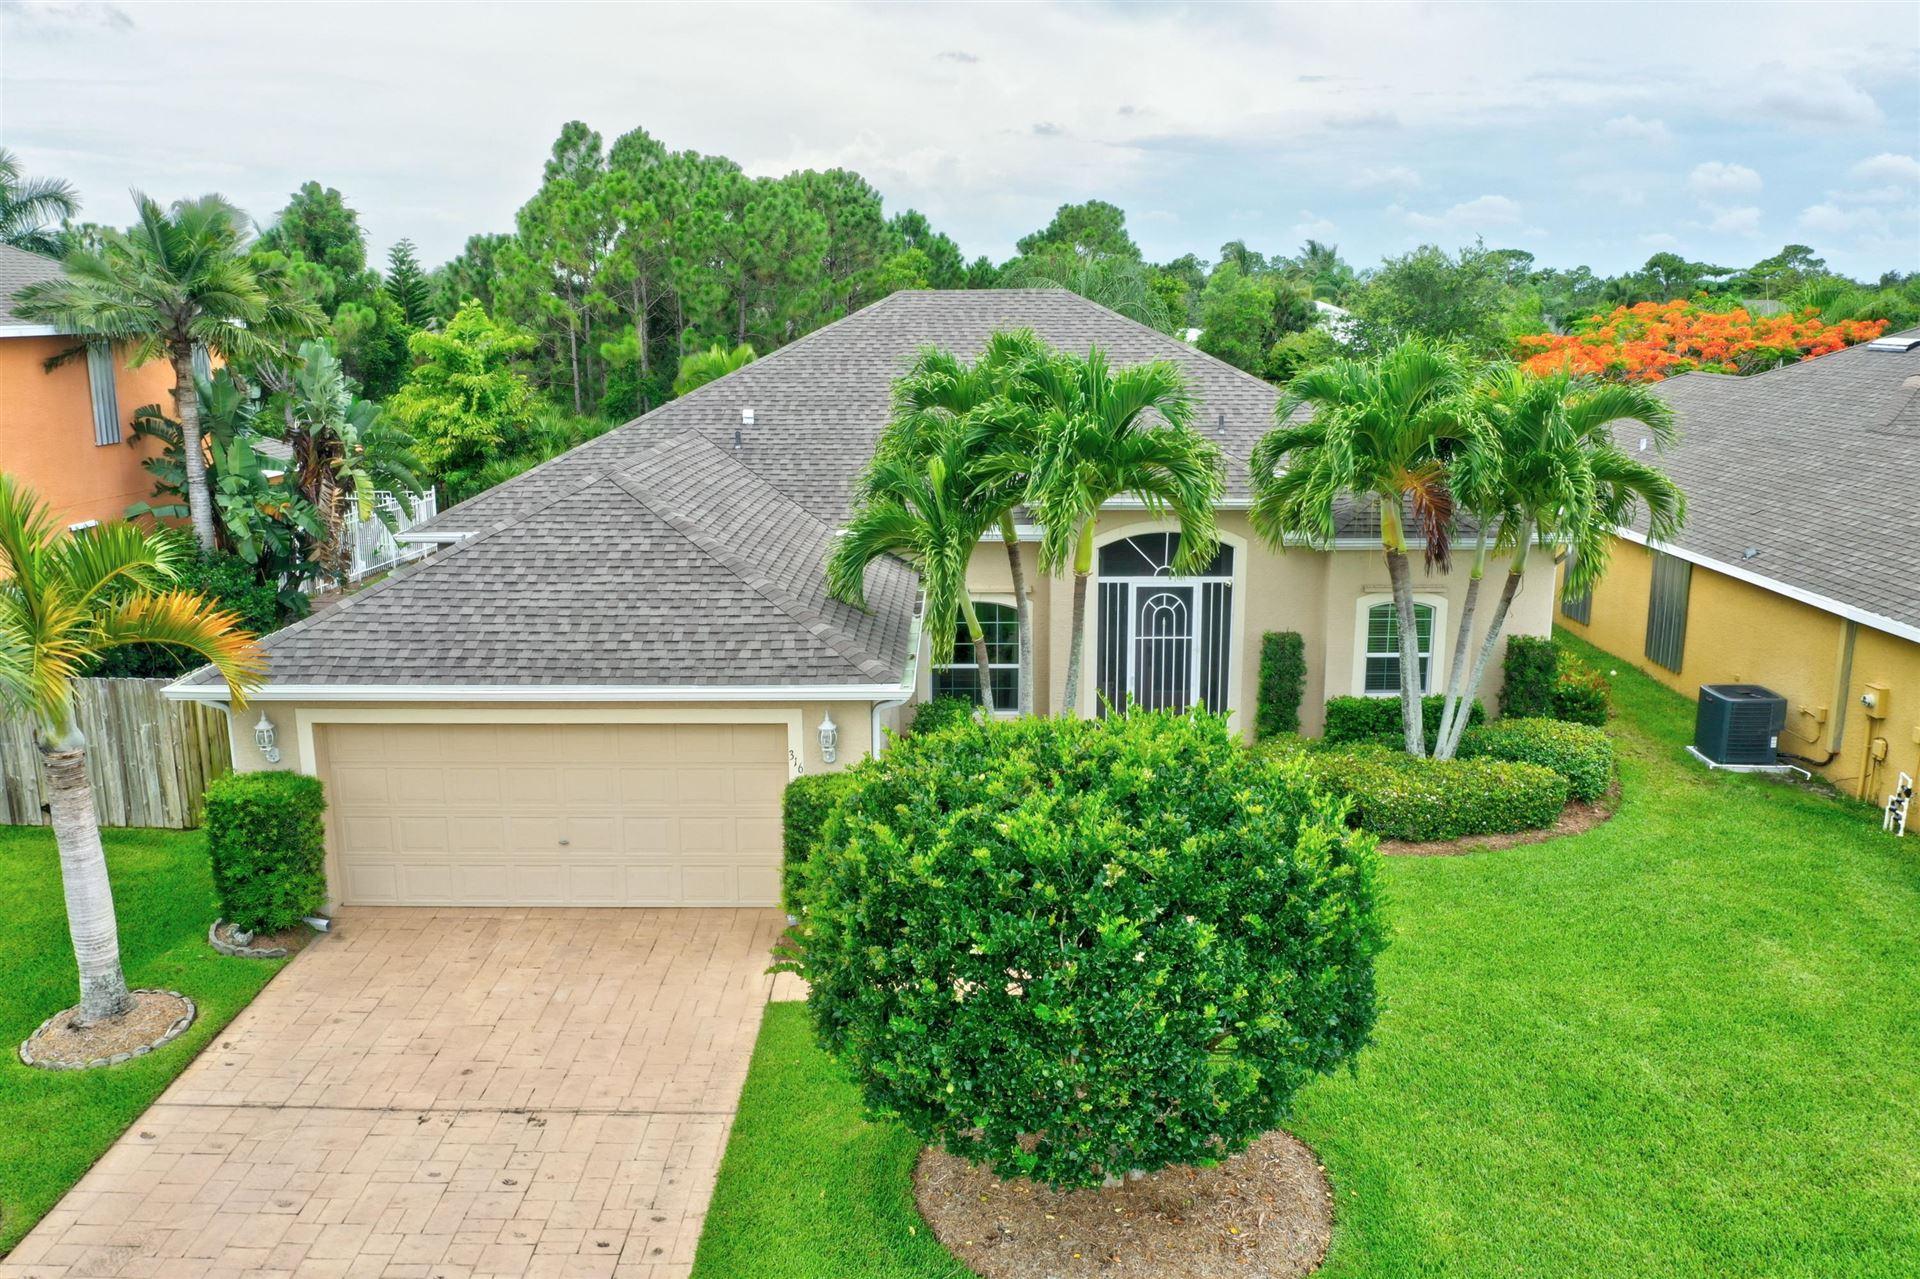 316 NW Emilia Way, Jensen Beach, FL 34957 - #: RX-10627547